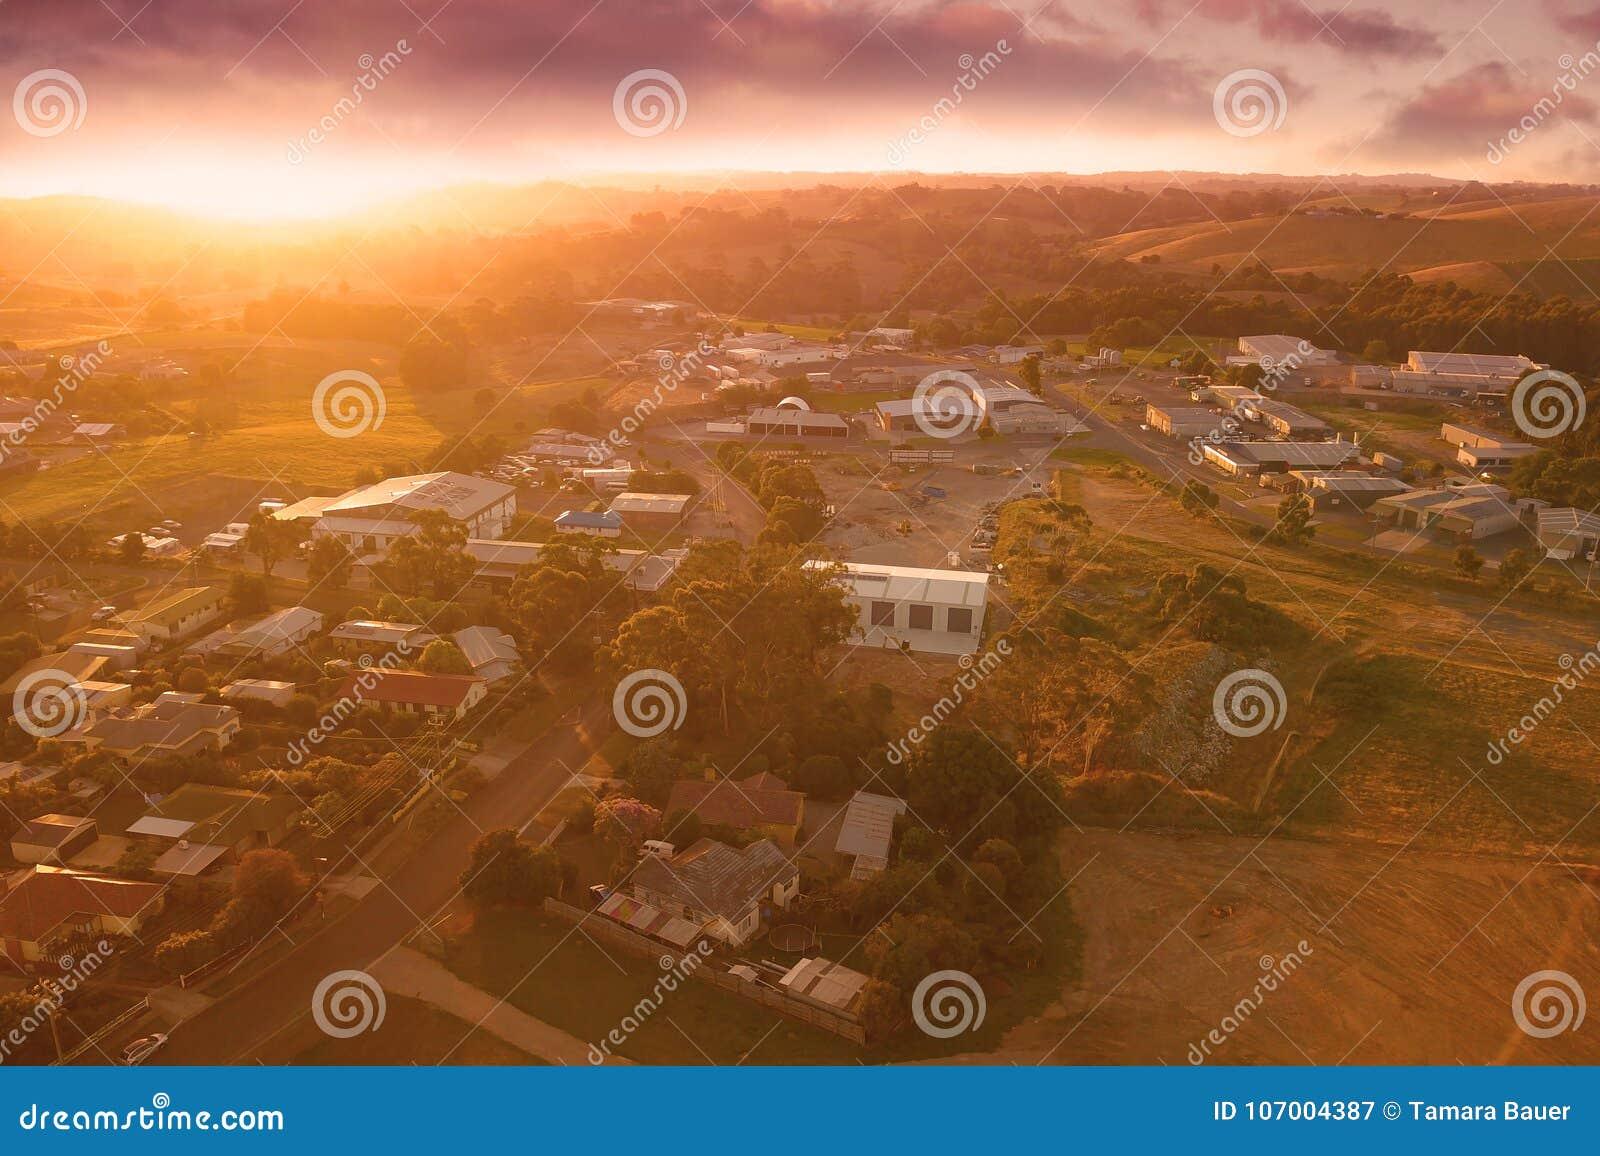 Korumburra township in South Gippsland